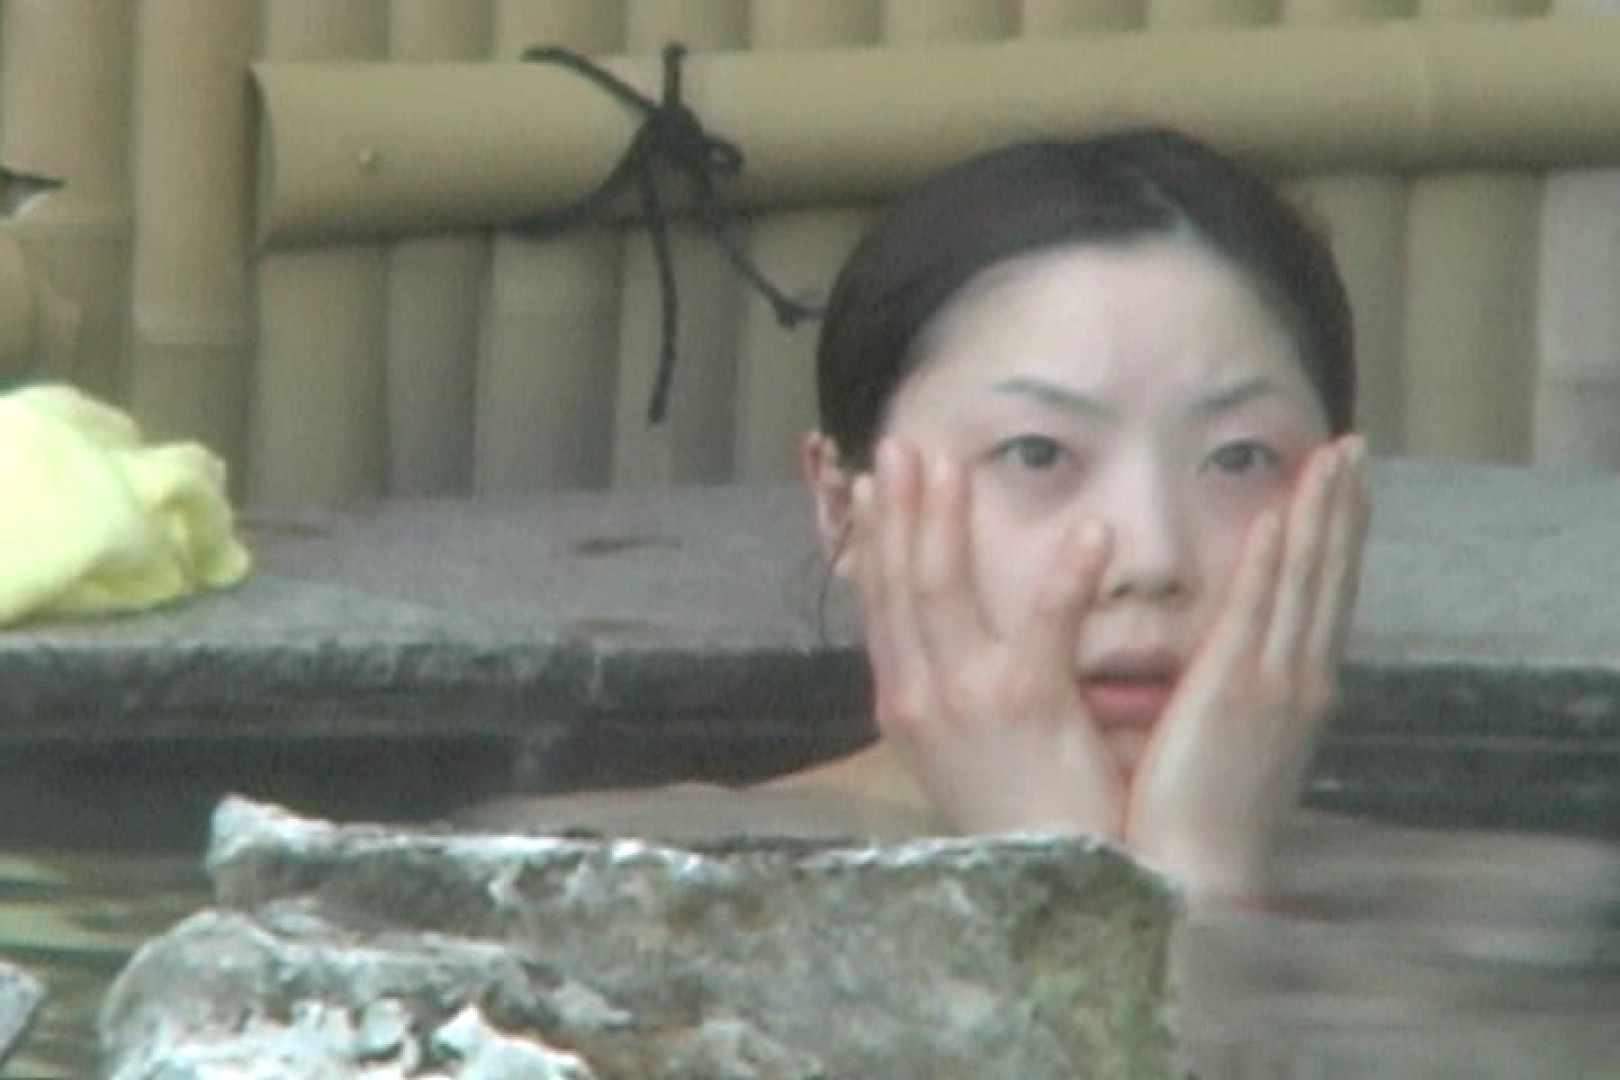 Aquaな露天風呂Vol.596 盗撮シリーズ | 露天風呂編  113PIX 5